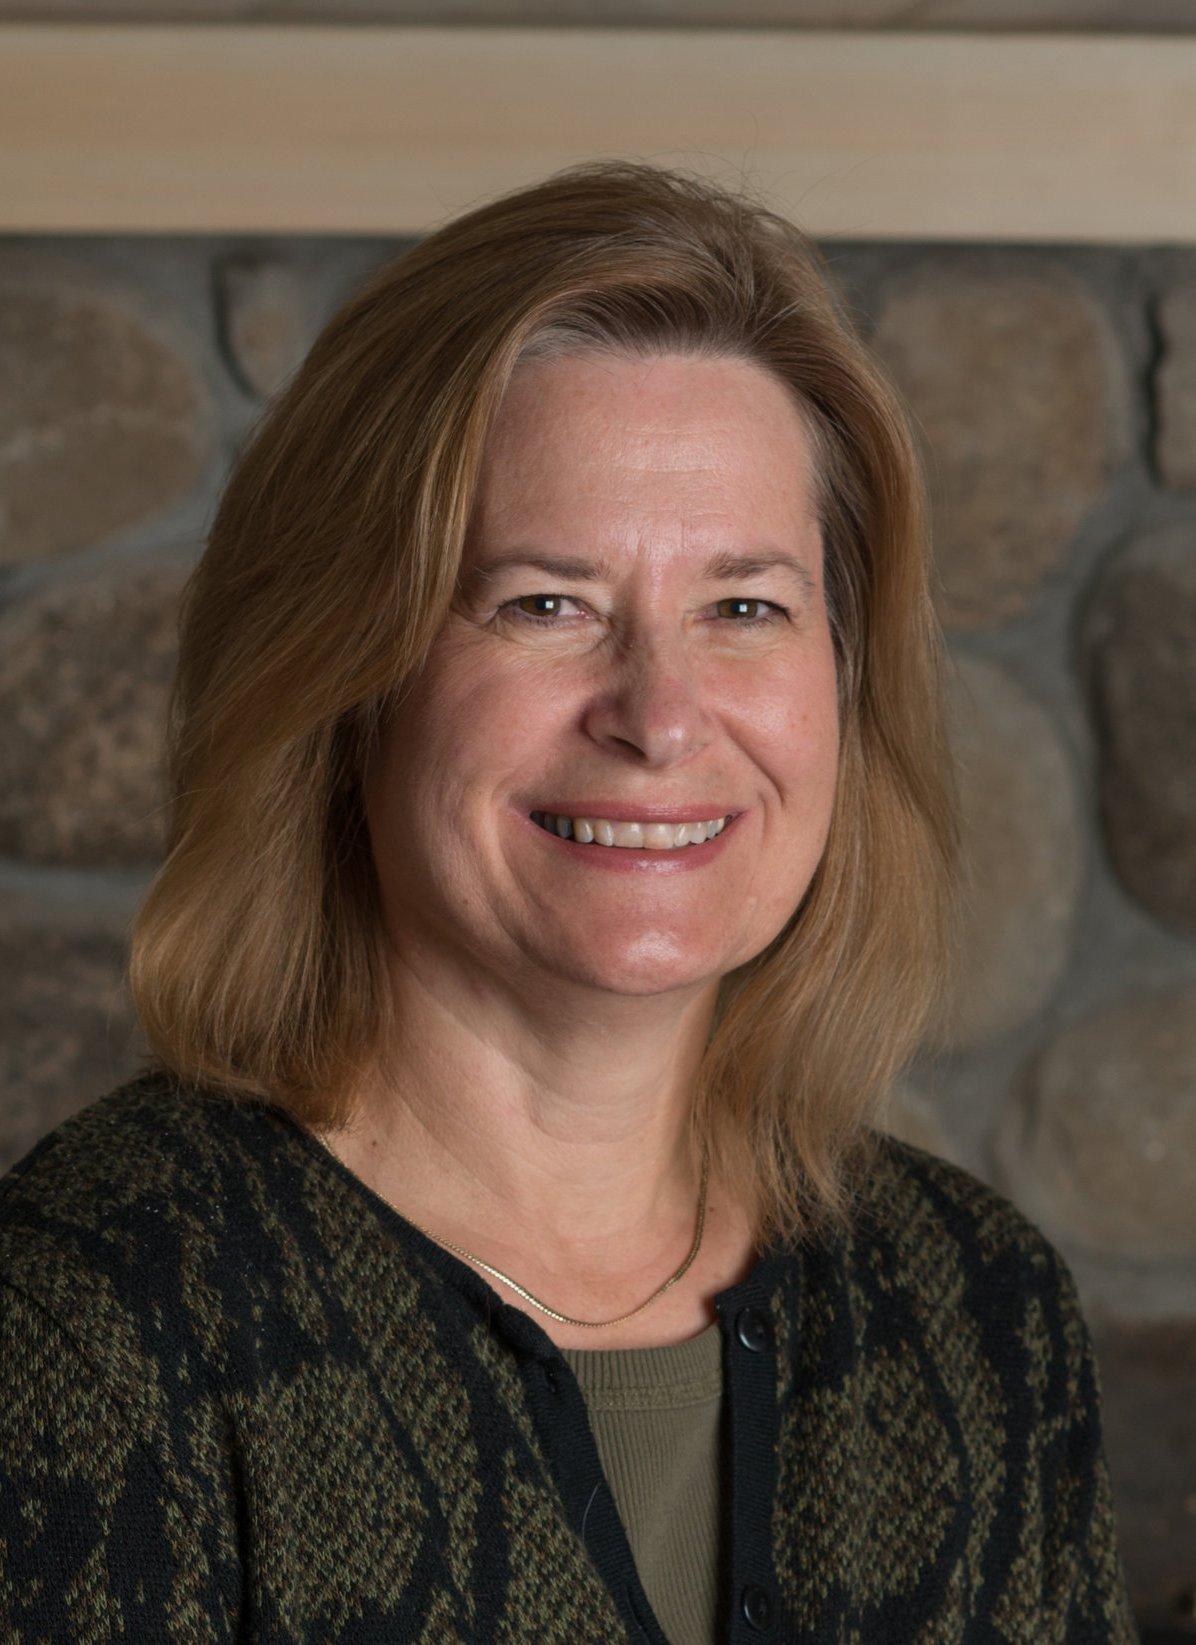 Terri Phillips